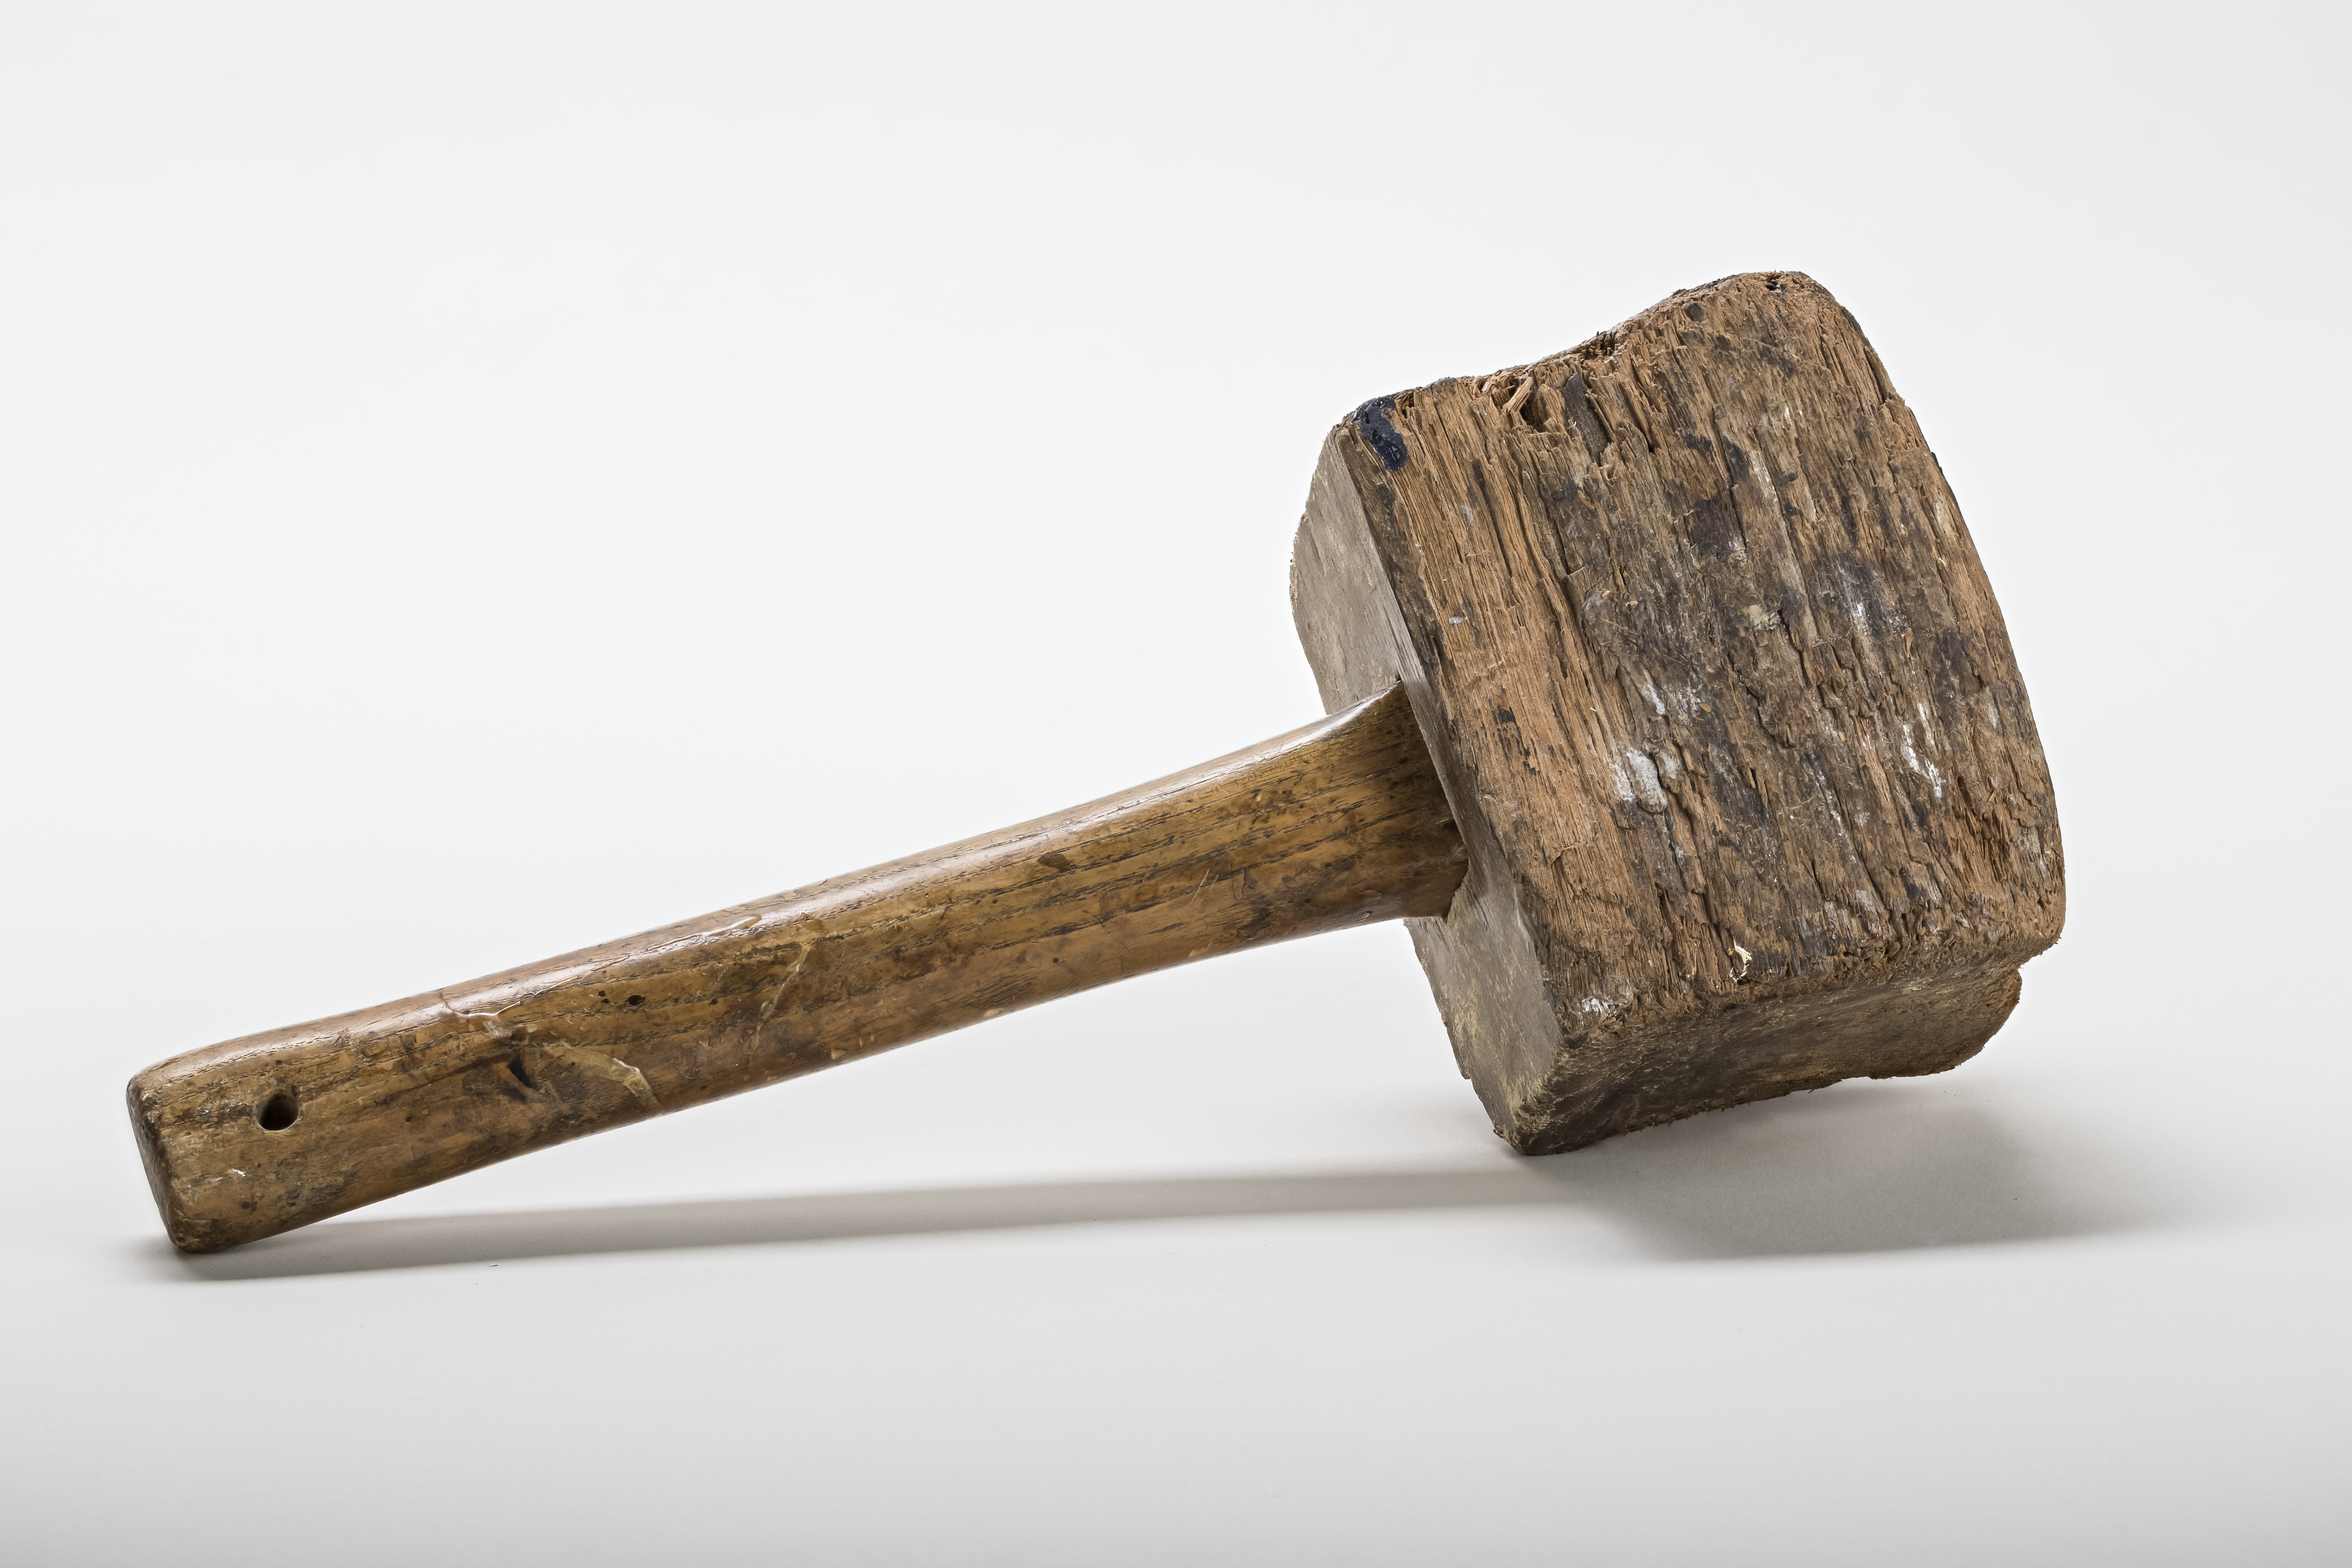 hammer mallet non-duality enlightenment